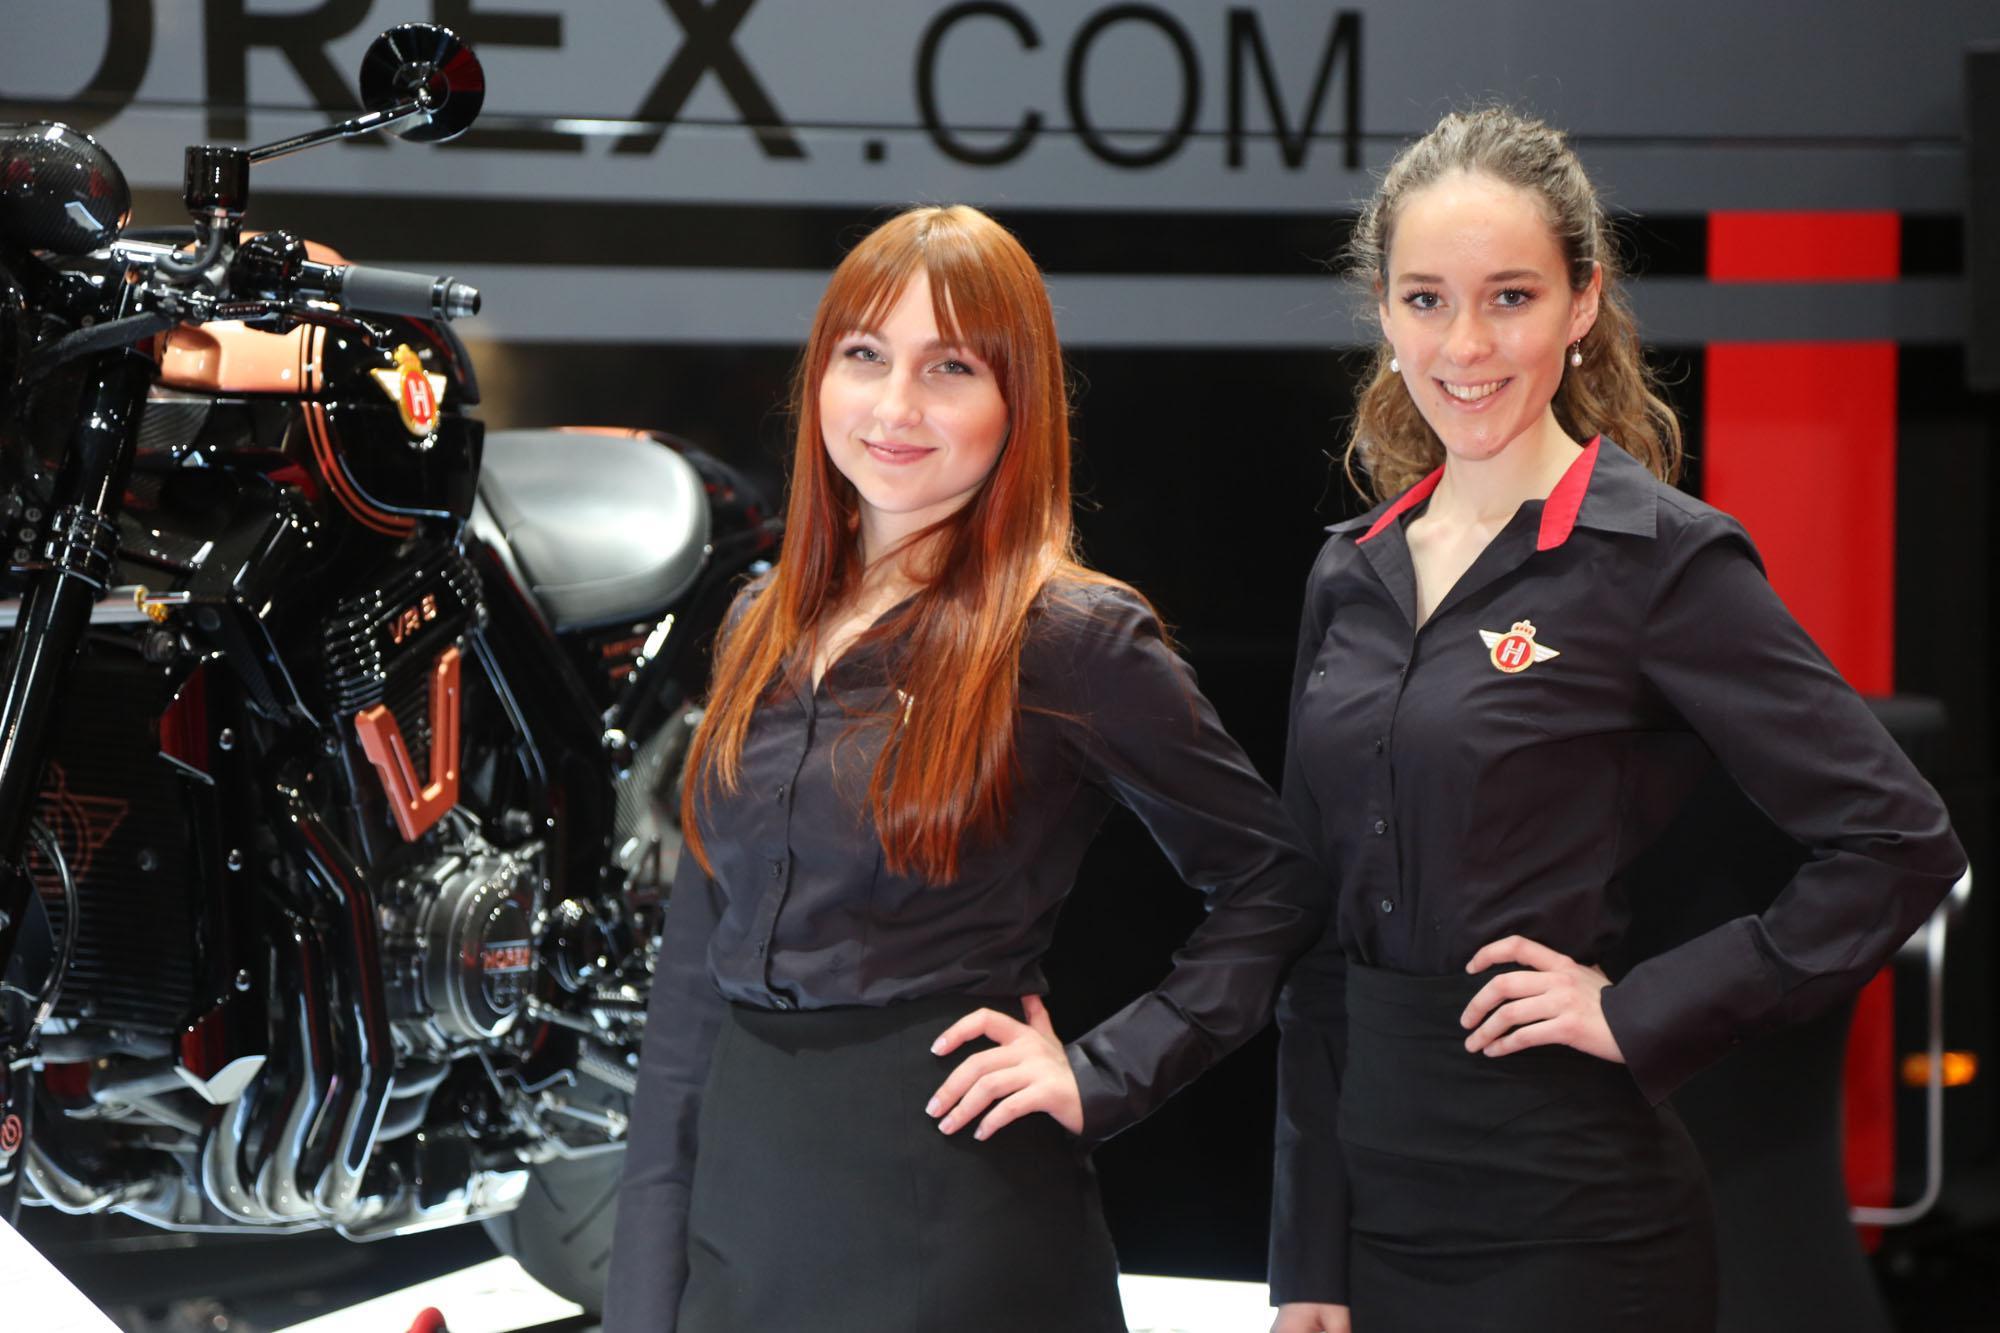 Motorräder Dortmund 2016 Highlights Girls Impressionen Foto